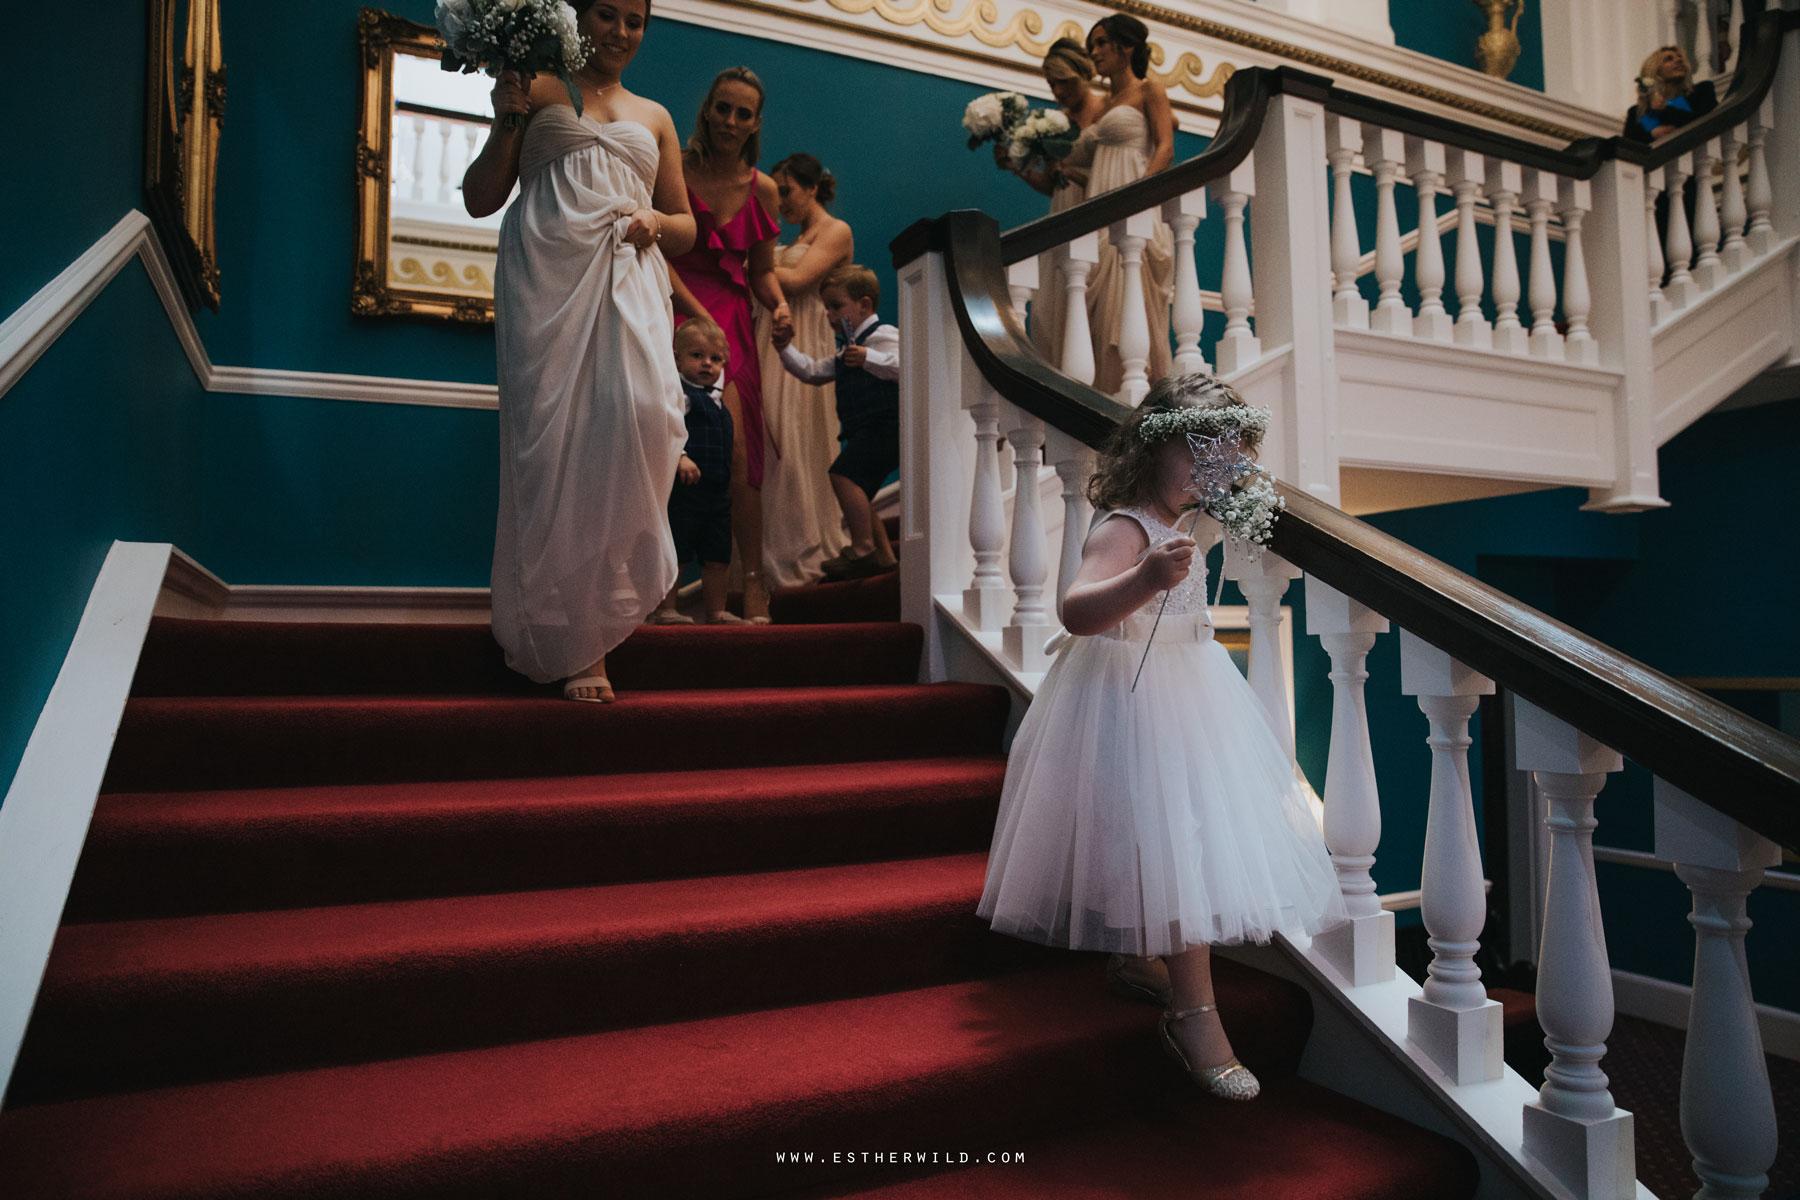 Lynford_Hall_Wedding_Thetford_Mundford_Esther_Wild_Photographer_IMG_1153.jpg